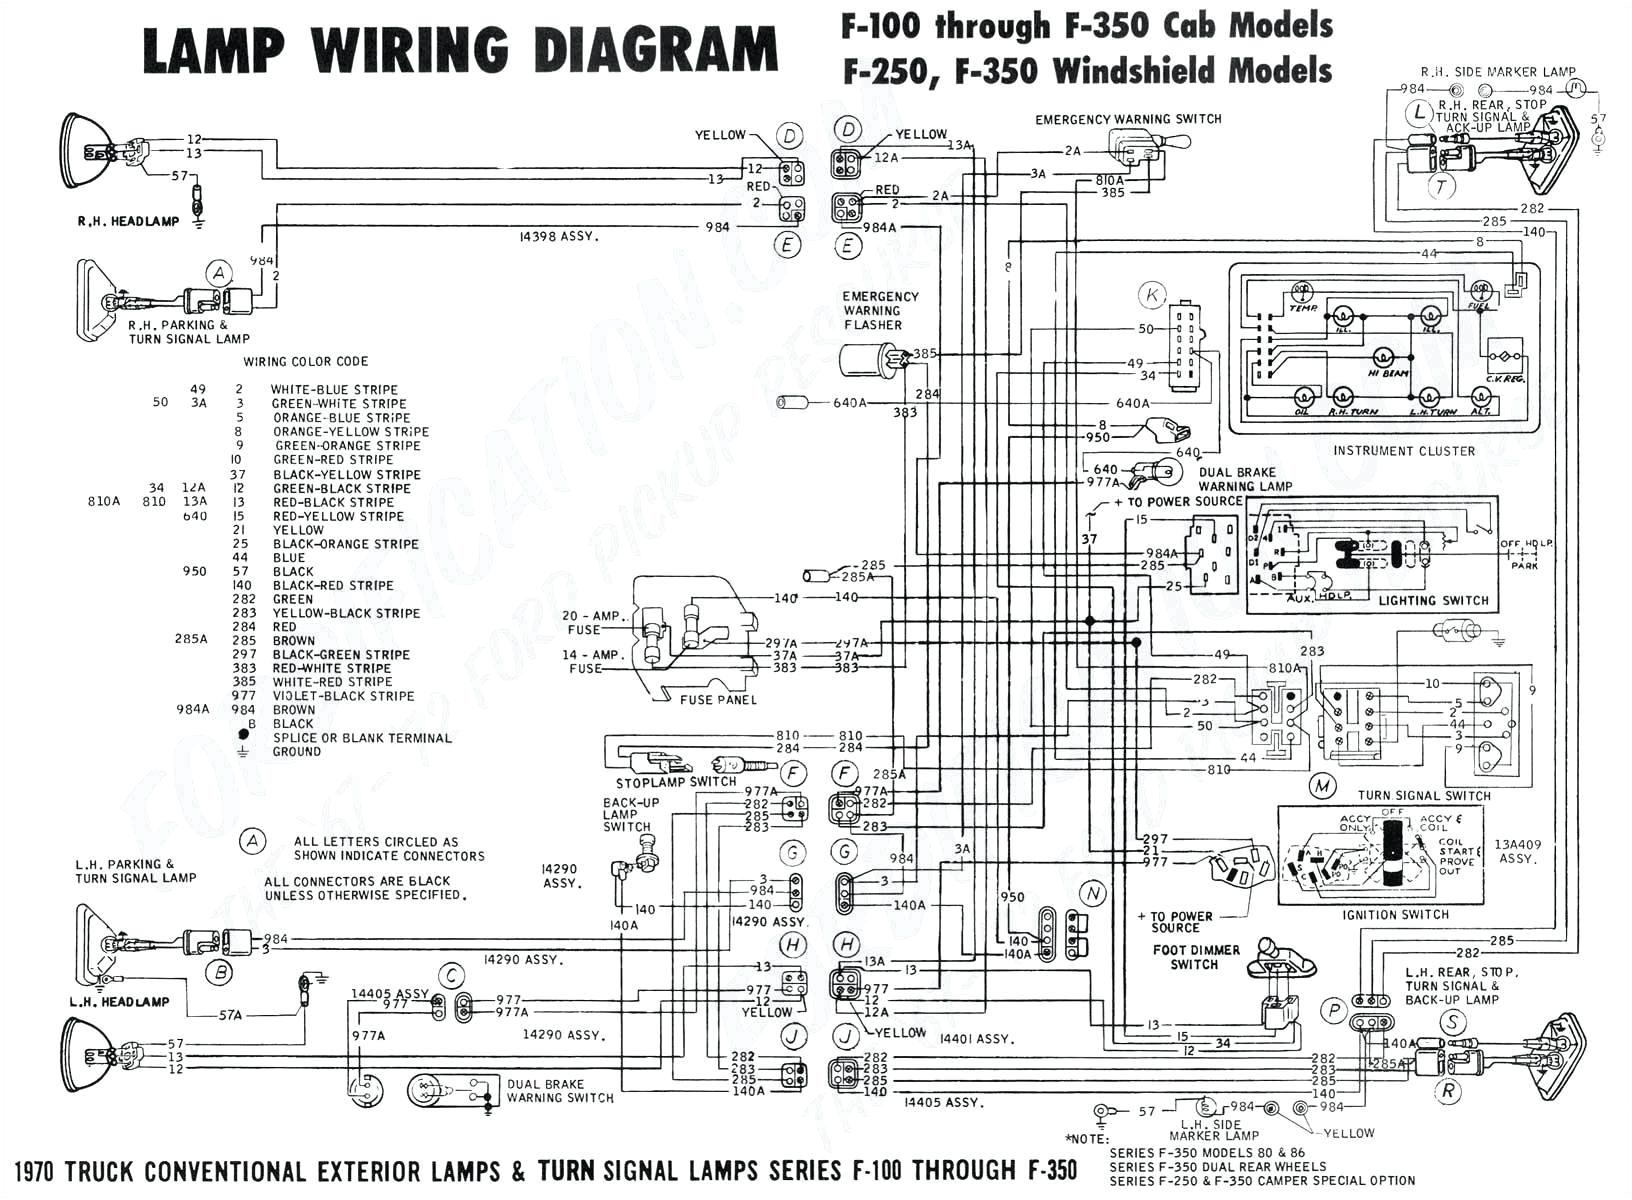 63 falcon headlight switch wiring diagram premium wiring diagram blog 1963 falcon wiring diagram wiring diagram